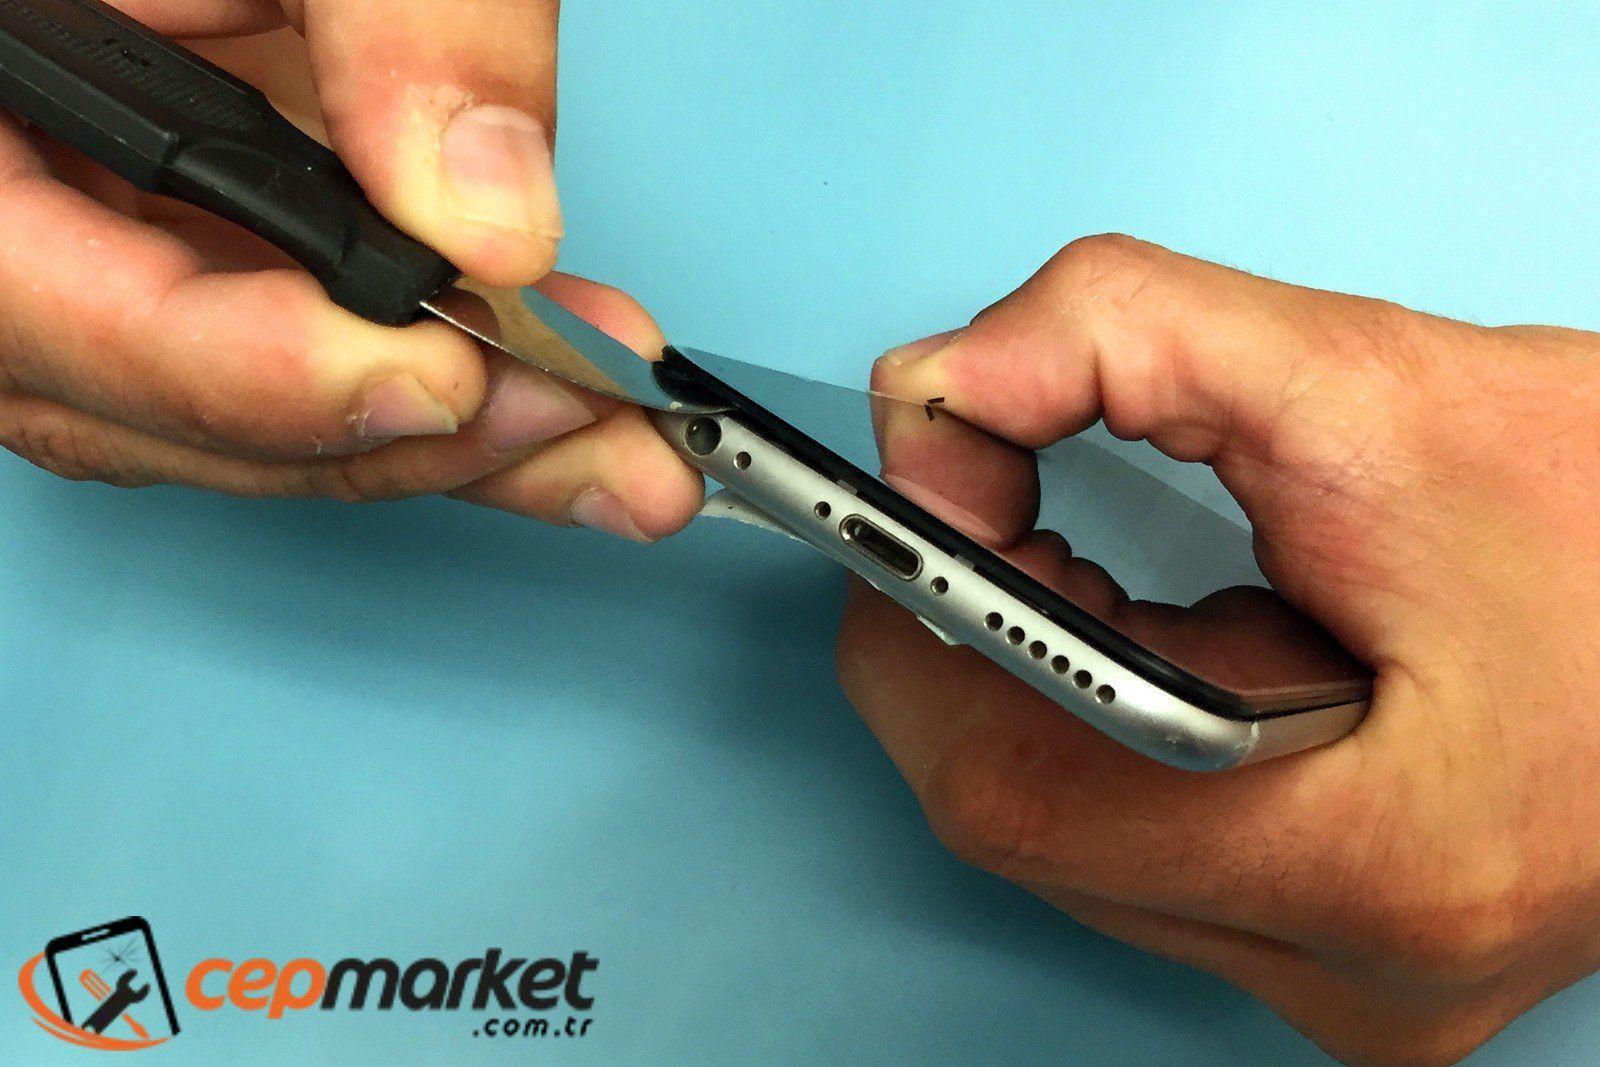 iPhone Cep Telefon Teknik Servis